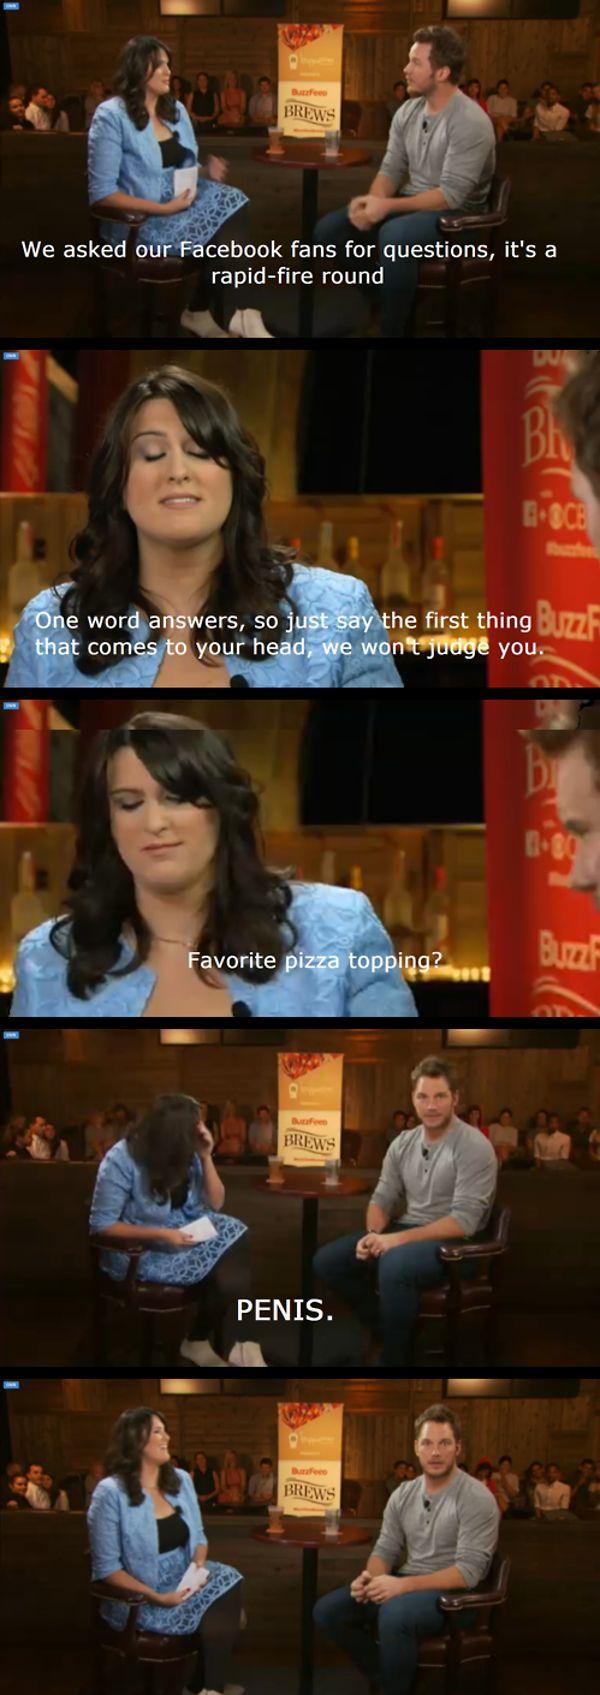 Chris Pratt Interview Facebook Question Favorite Pizza Topping